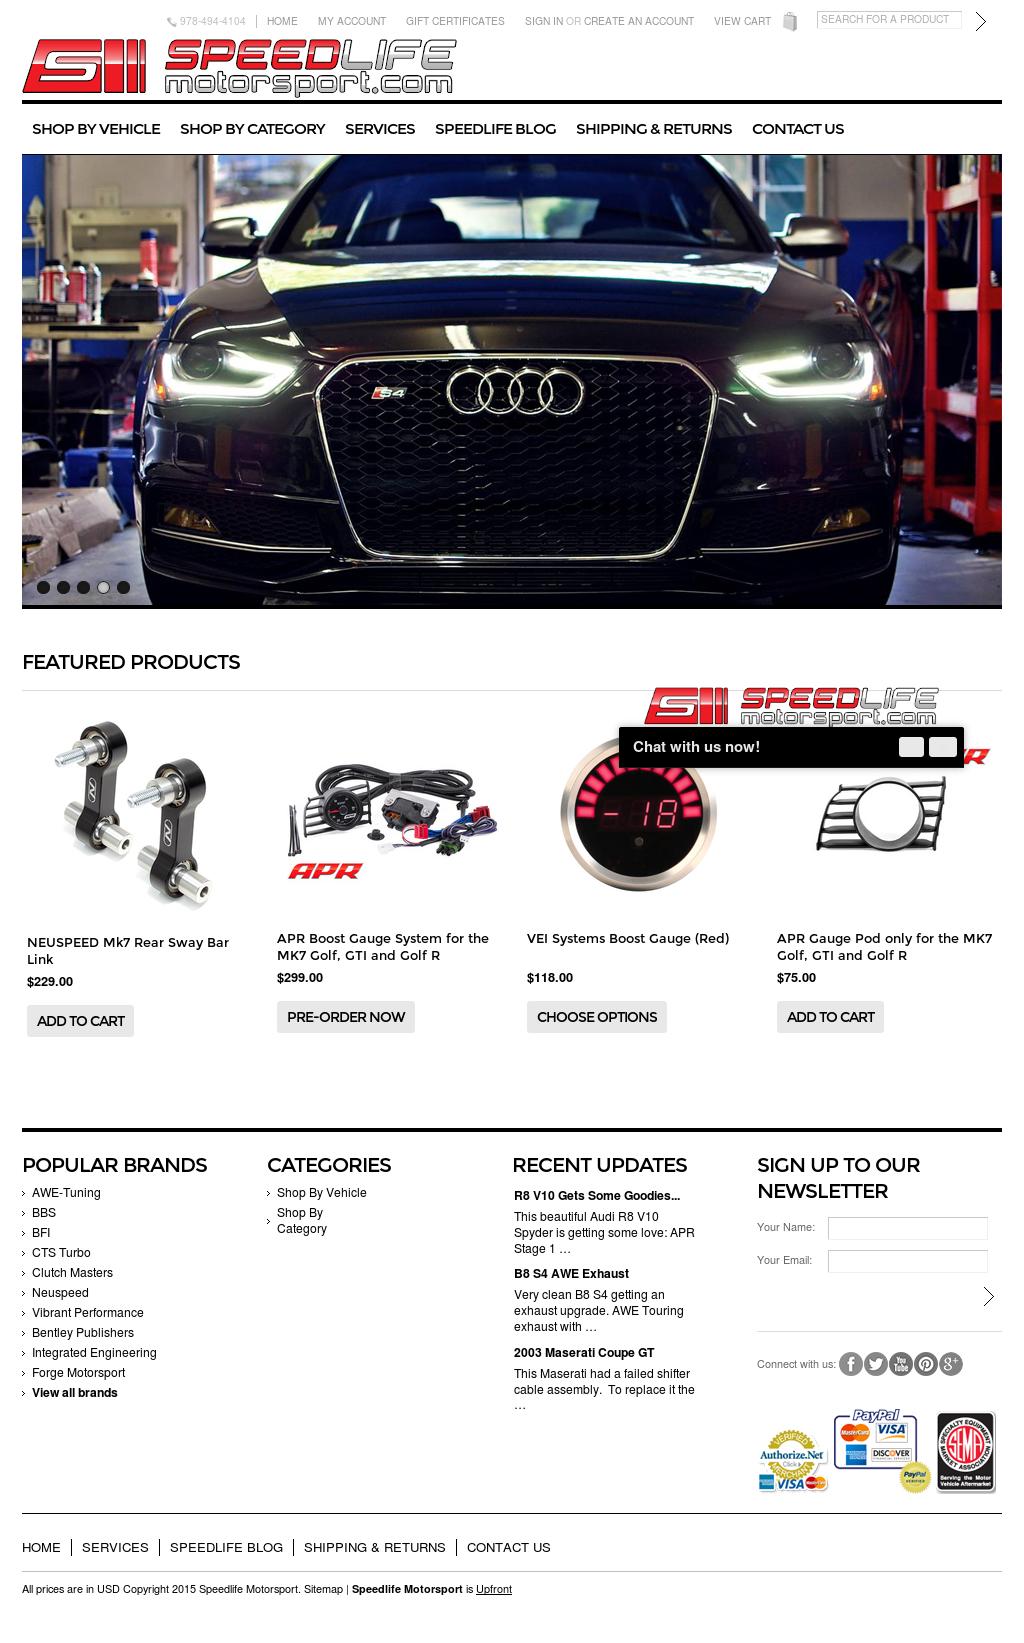 Speedlife Motorsport Competitors, Revenue and Employees